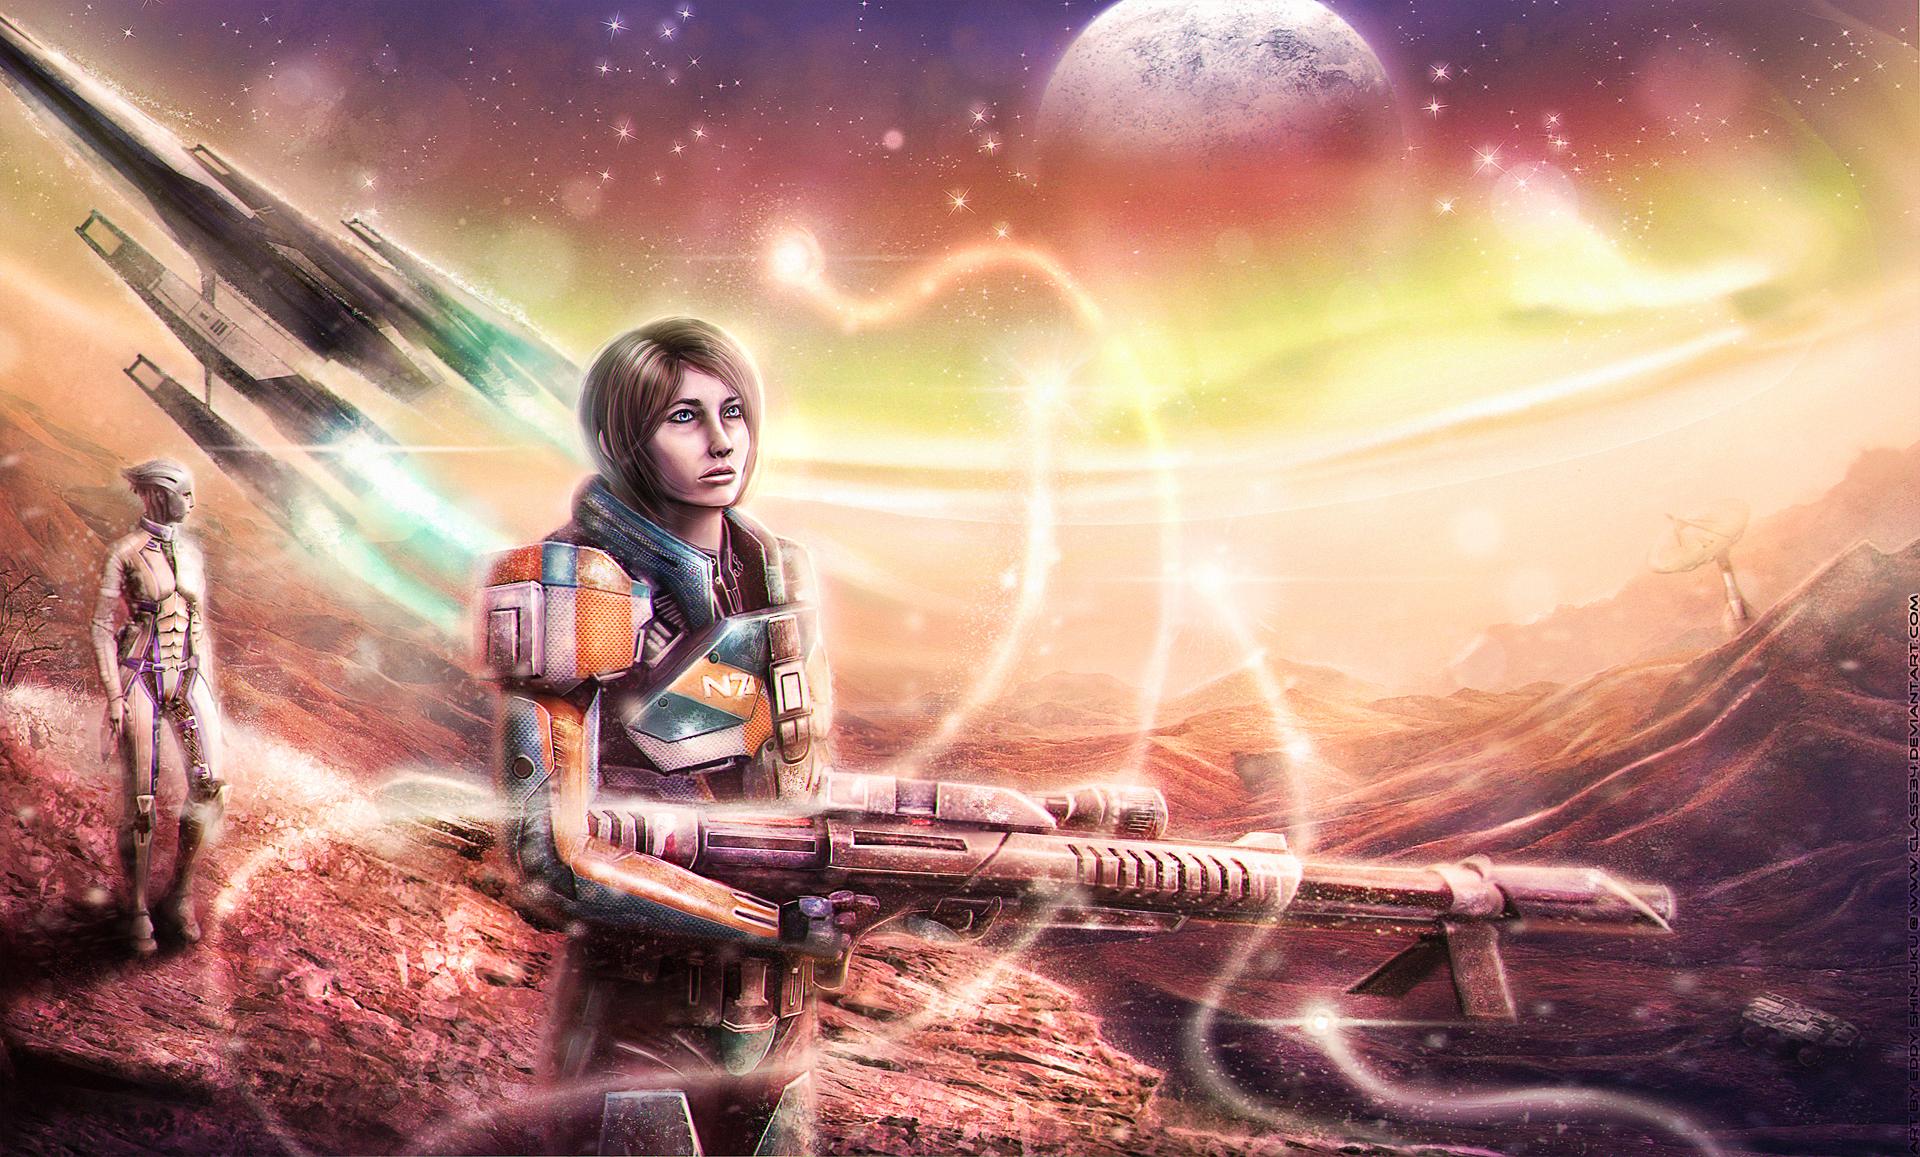 SPIRITS - Mass Effect (OC Commision) by Eddy-Shinjuku